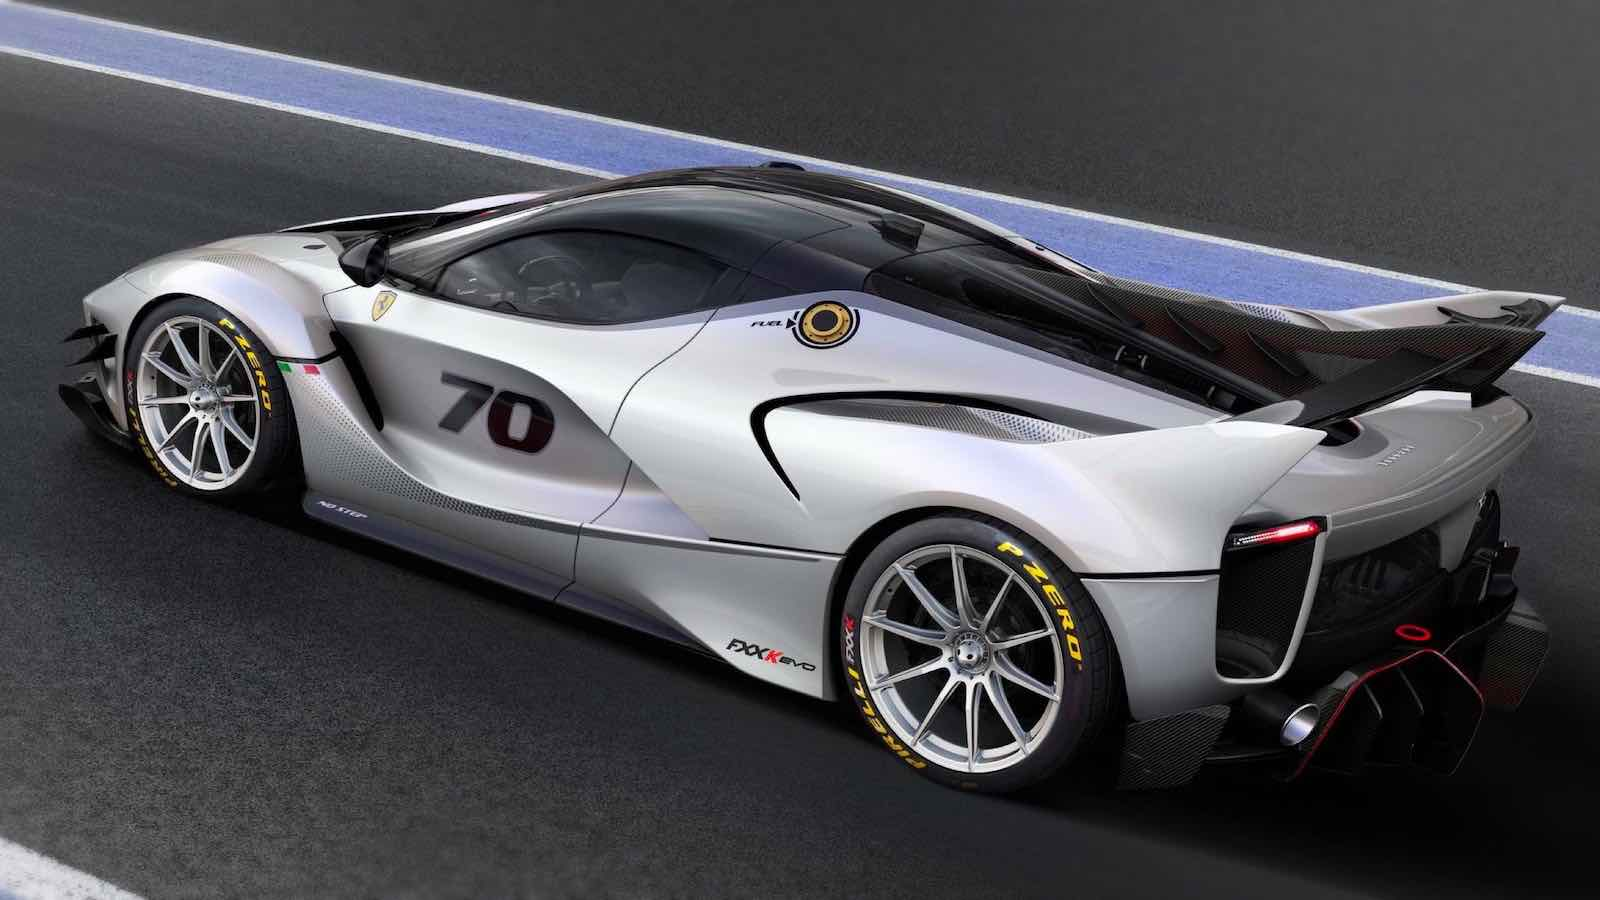 Fxx K Evo 2018 Ferrari Presenta Su Mas Extremo Superdeportivo Hasta La Fecha